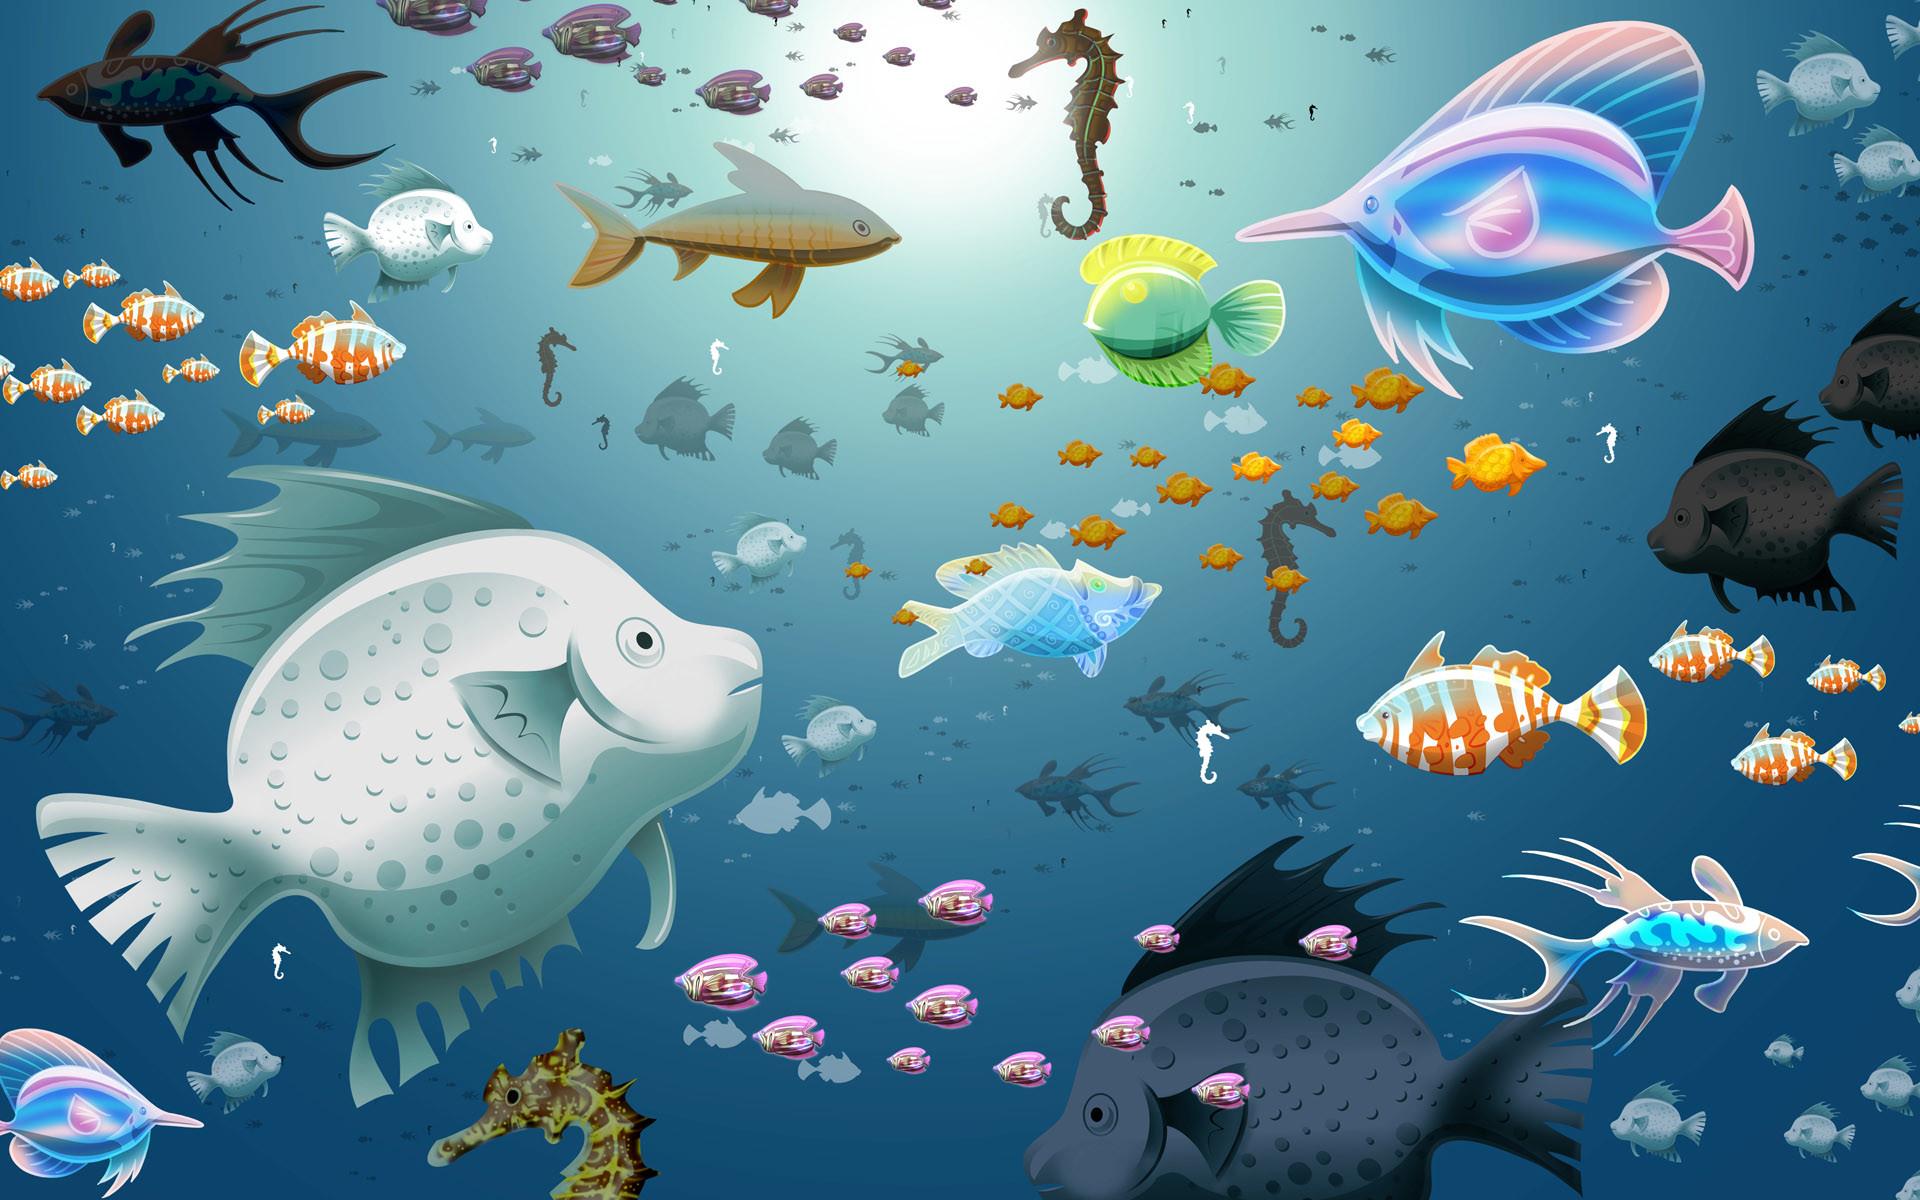 Desktop Wallpaper HD Animated